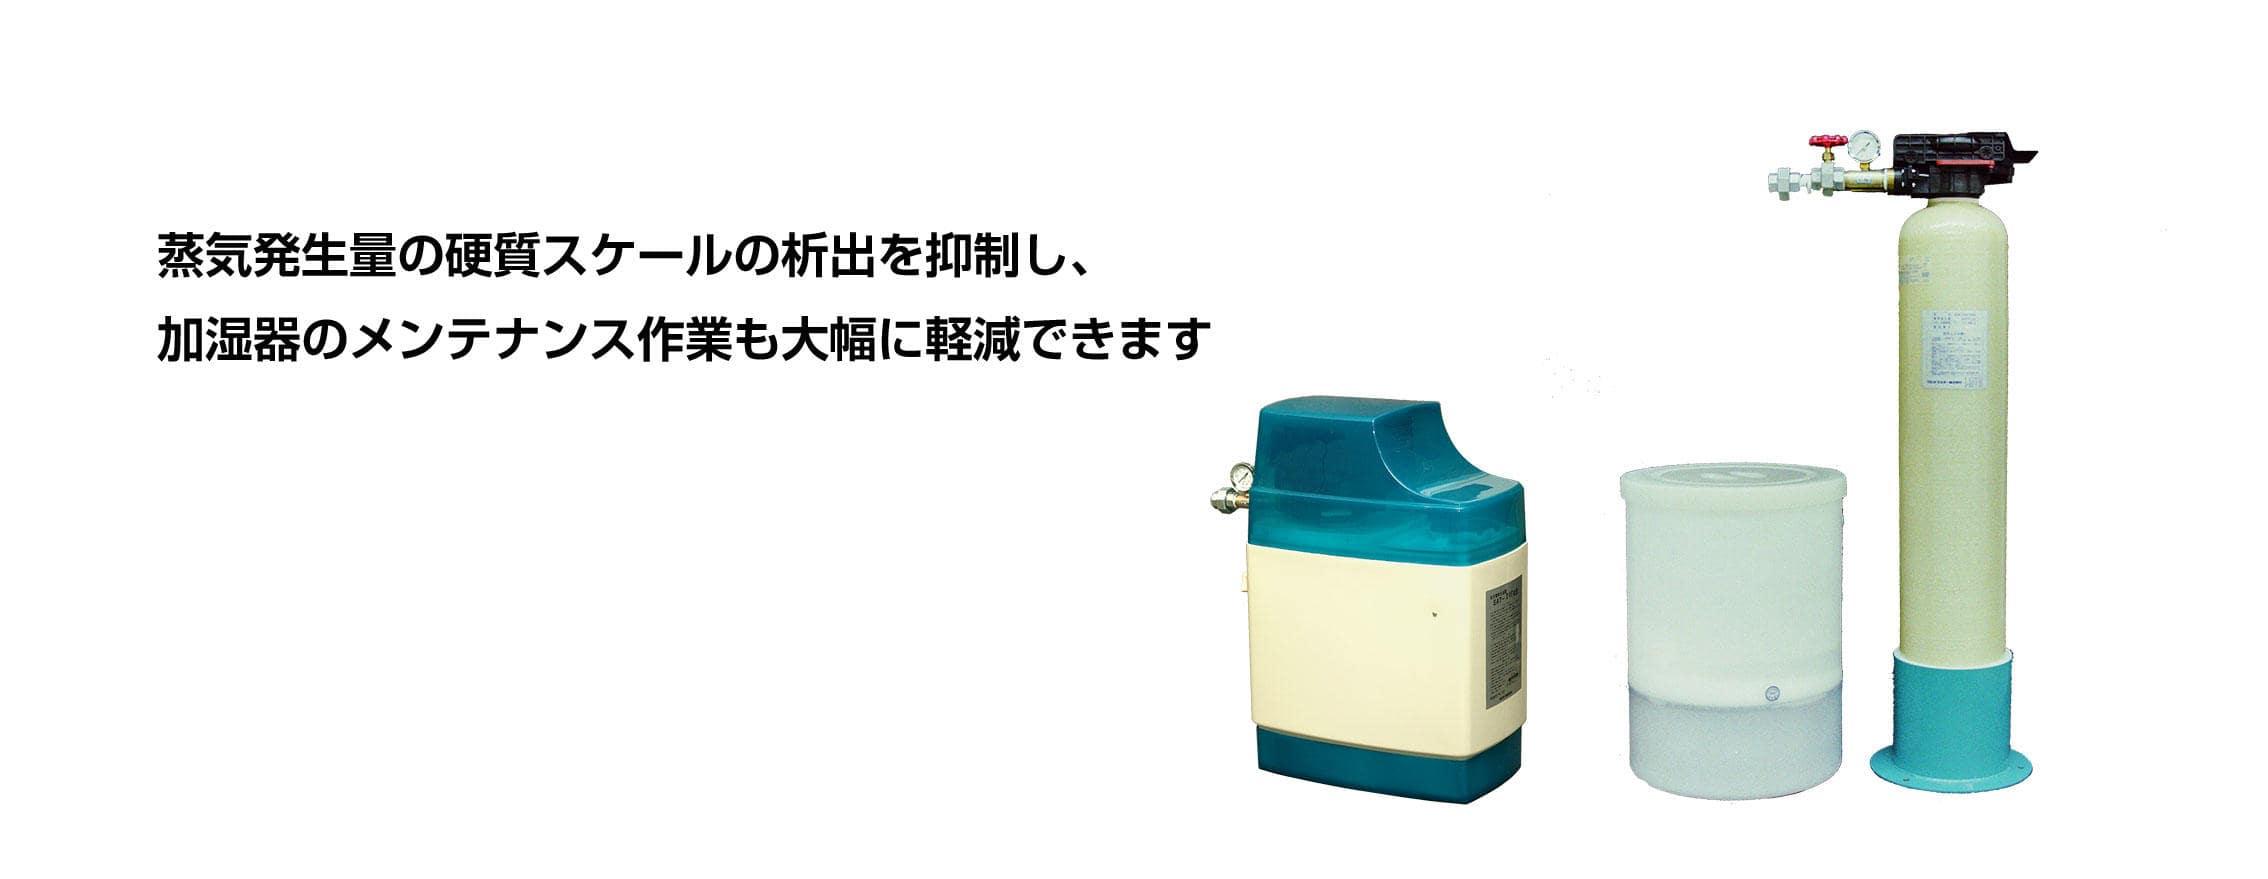 自動再生型軟水器WSBタイプ